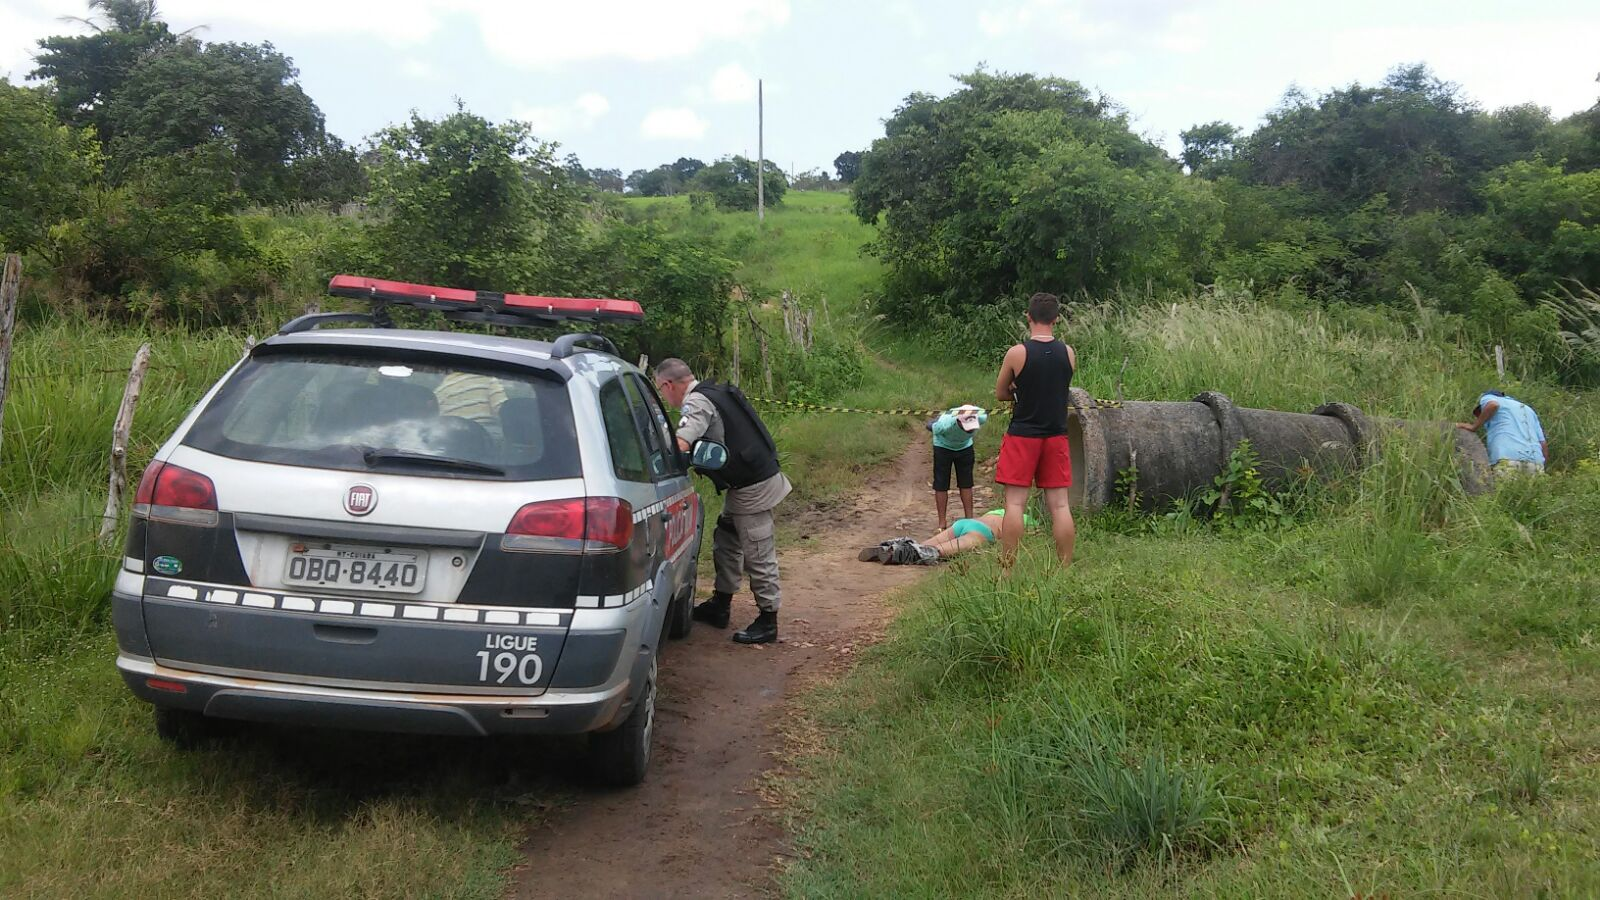 Corpo do mototaxista foi encontrado na zona rural de Lagoa de Dentro (Foto: Reprodução/WhatsApp)